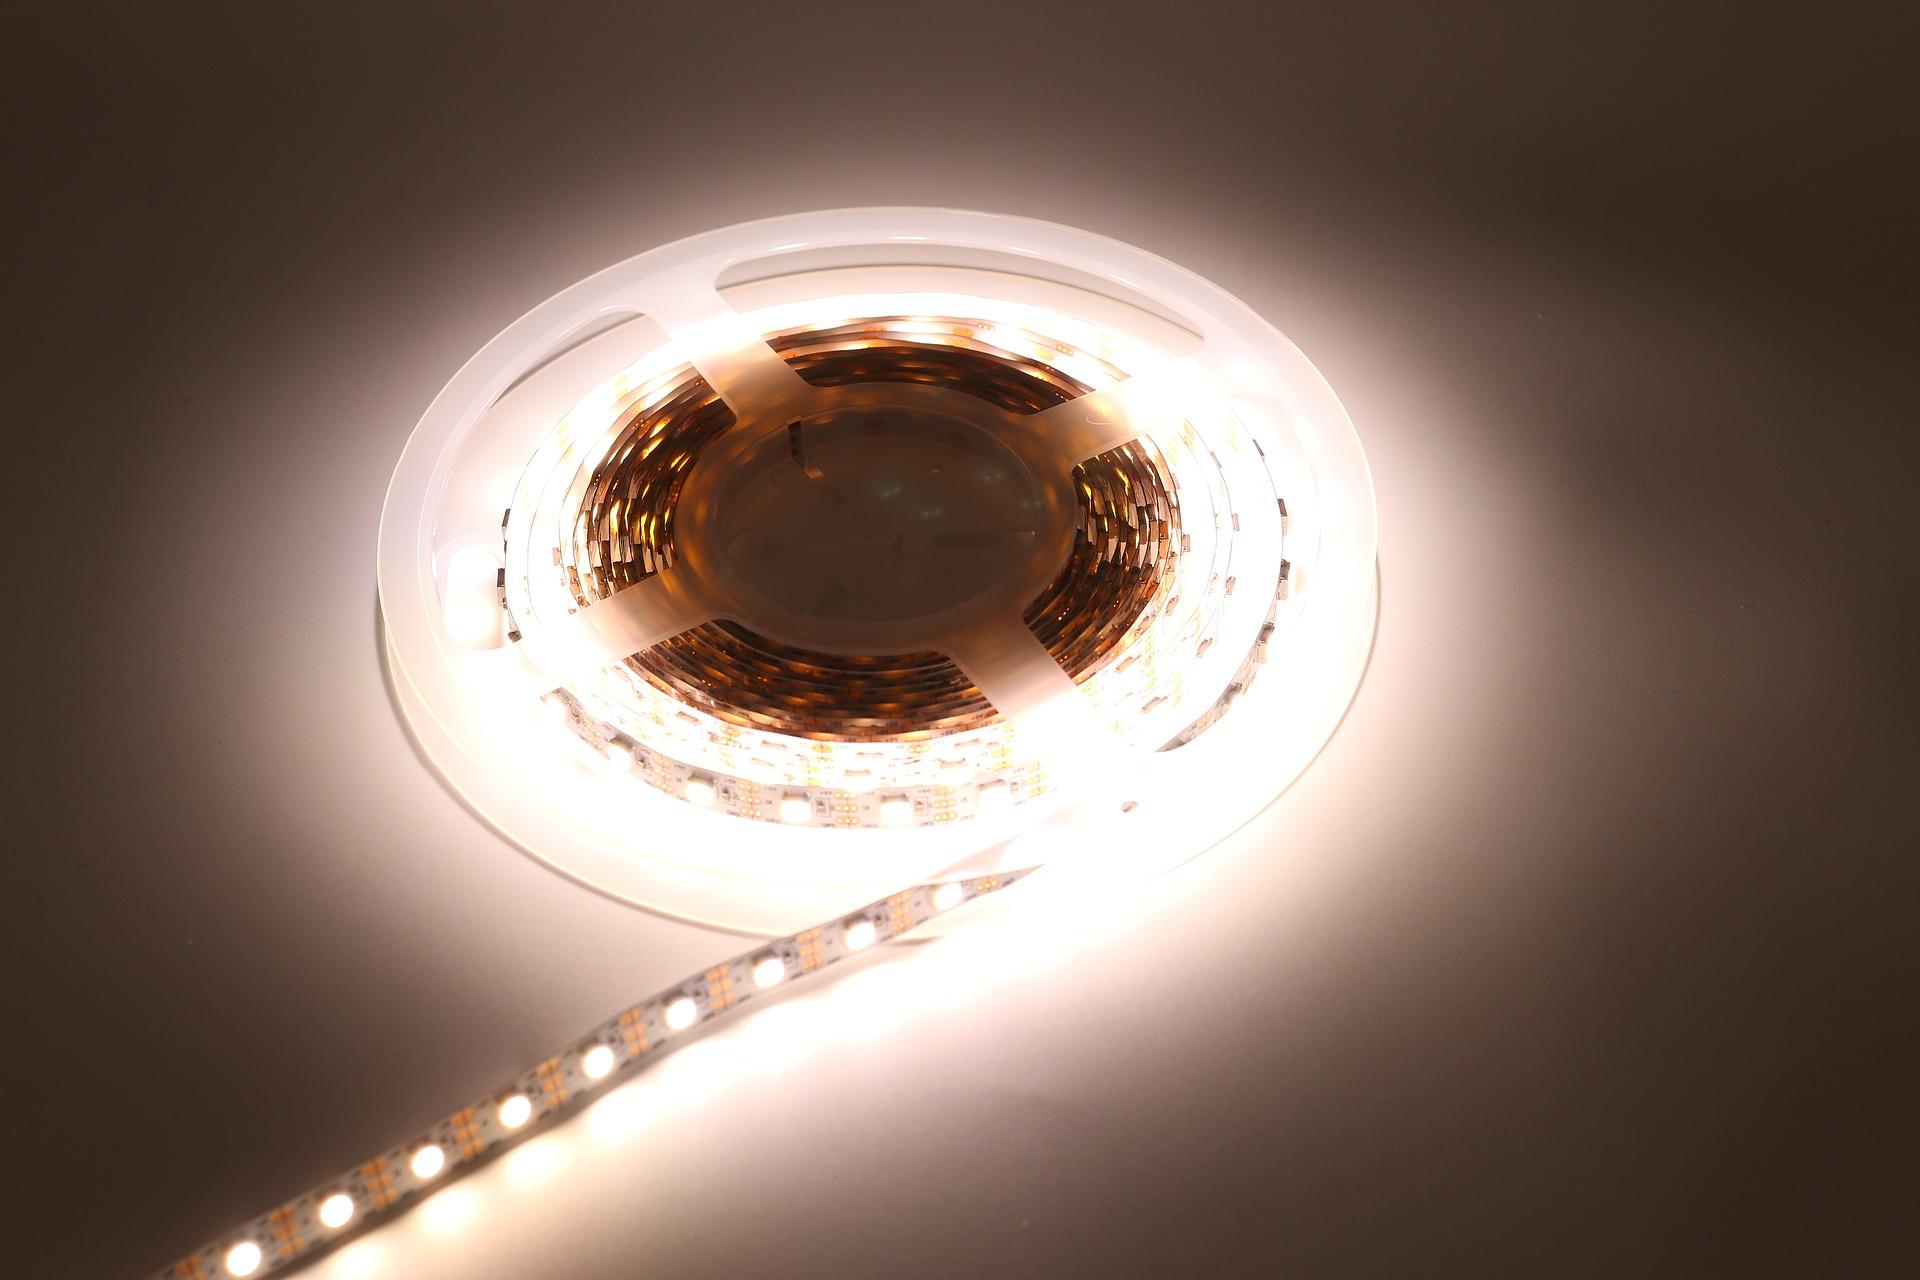 Strip Led Piu Luminosi differenza strisce led 5630, 2835, 5050, 3014, 3020